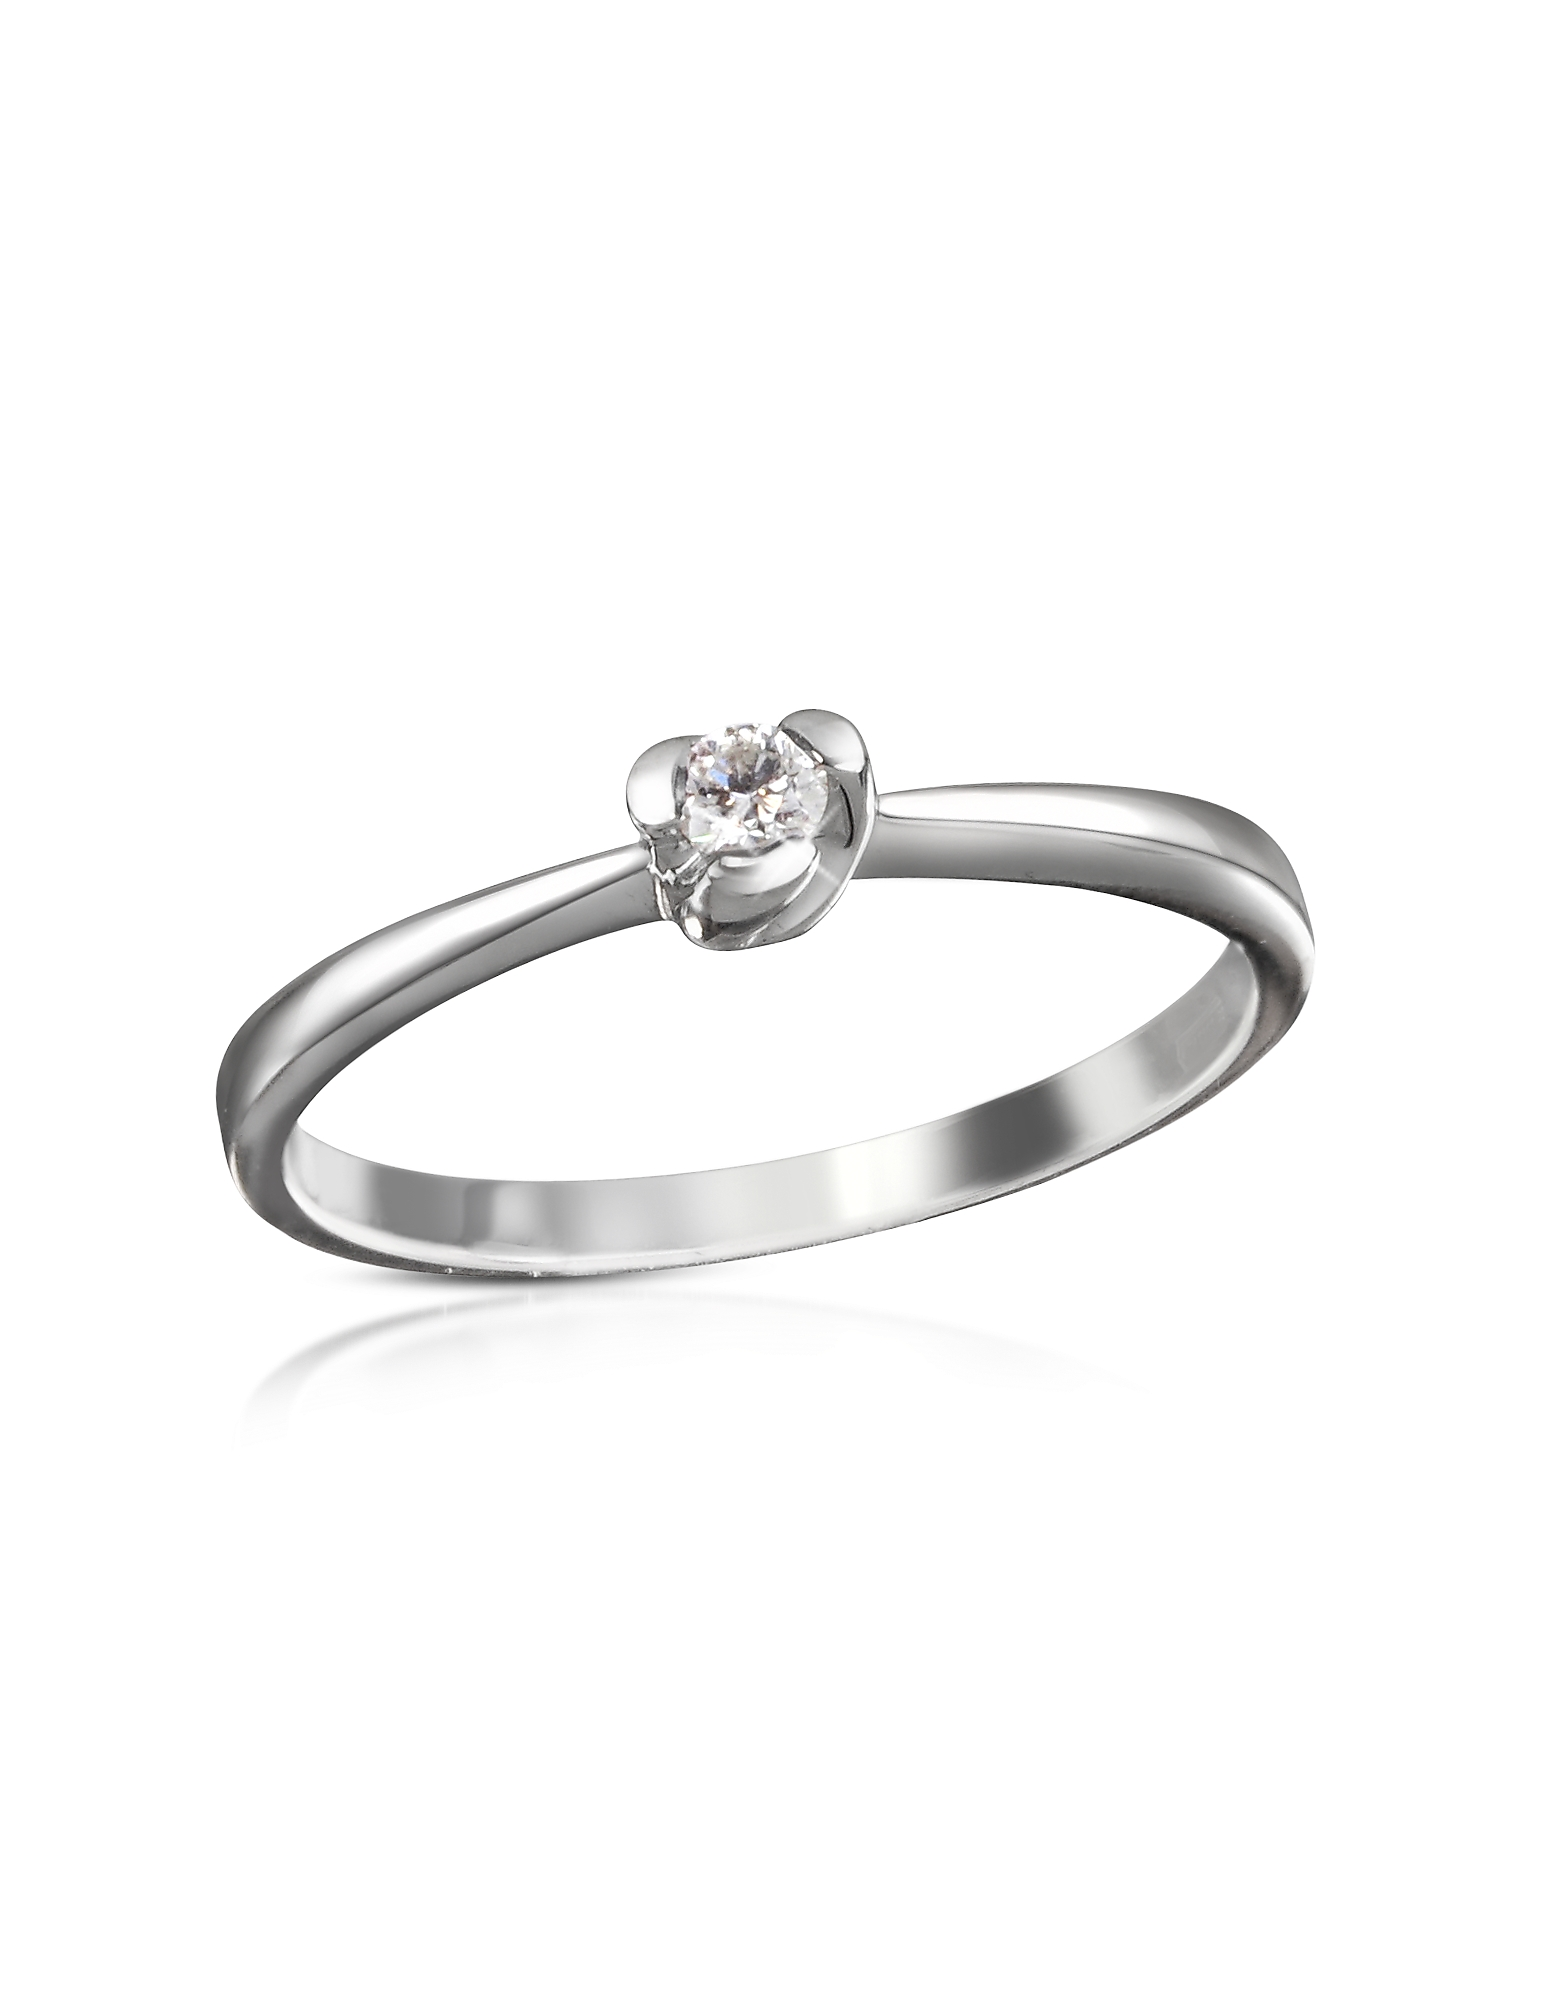 Кольцо с Бриллиантом 0.08 карата